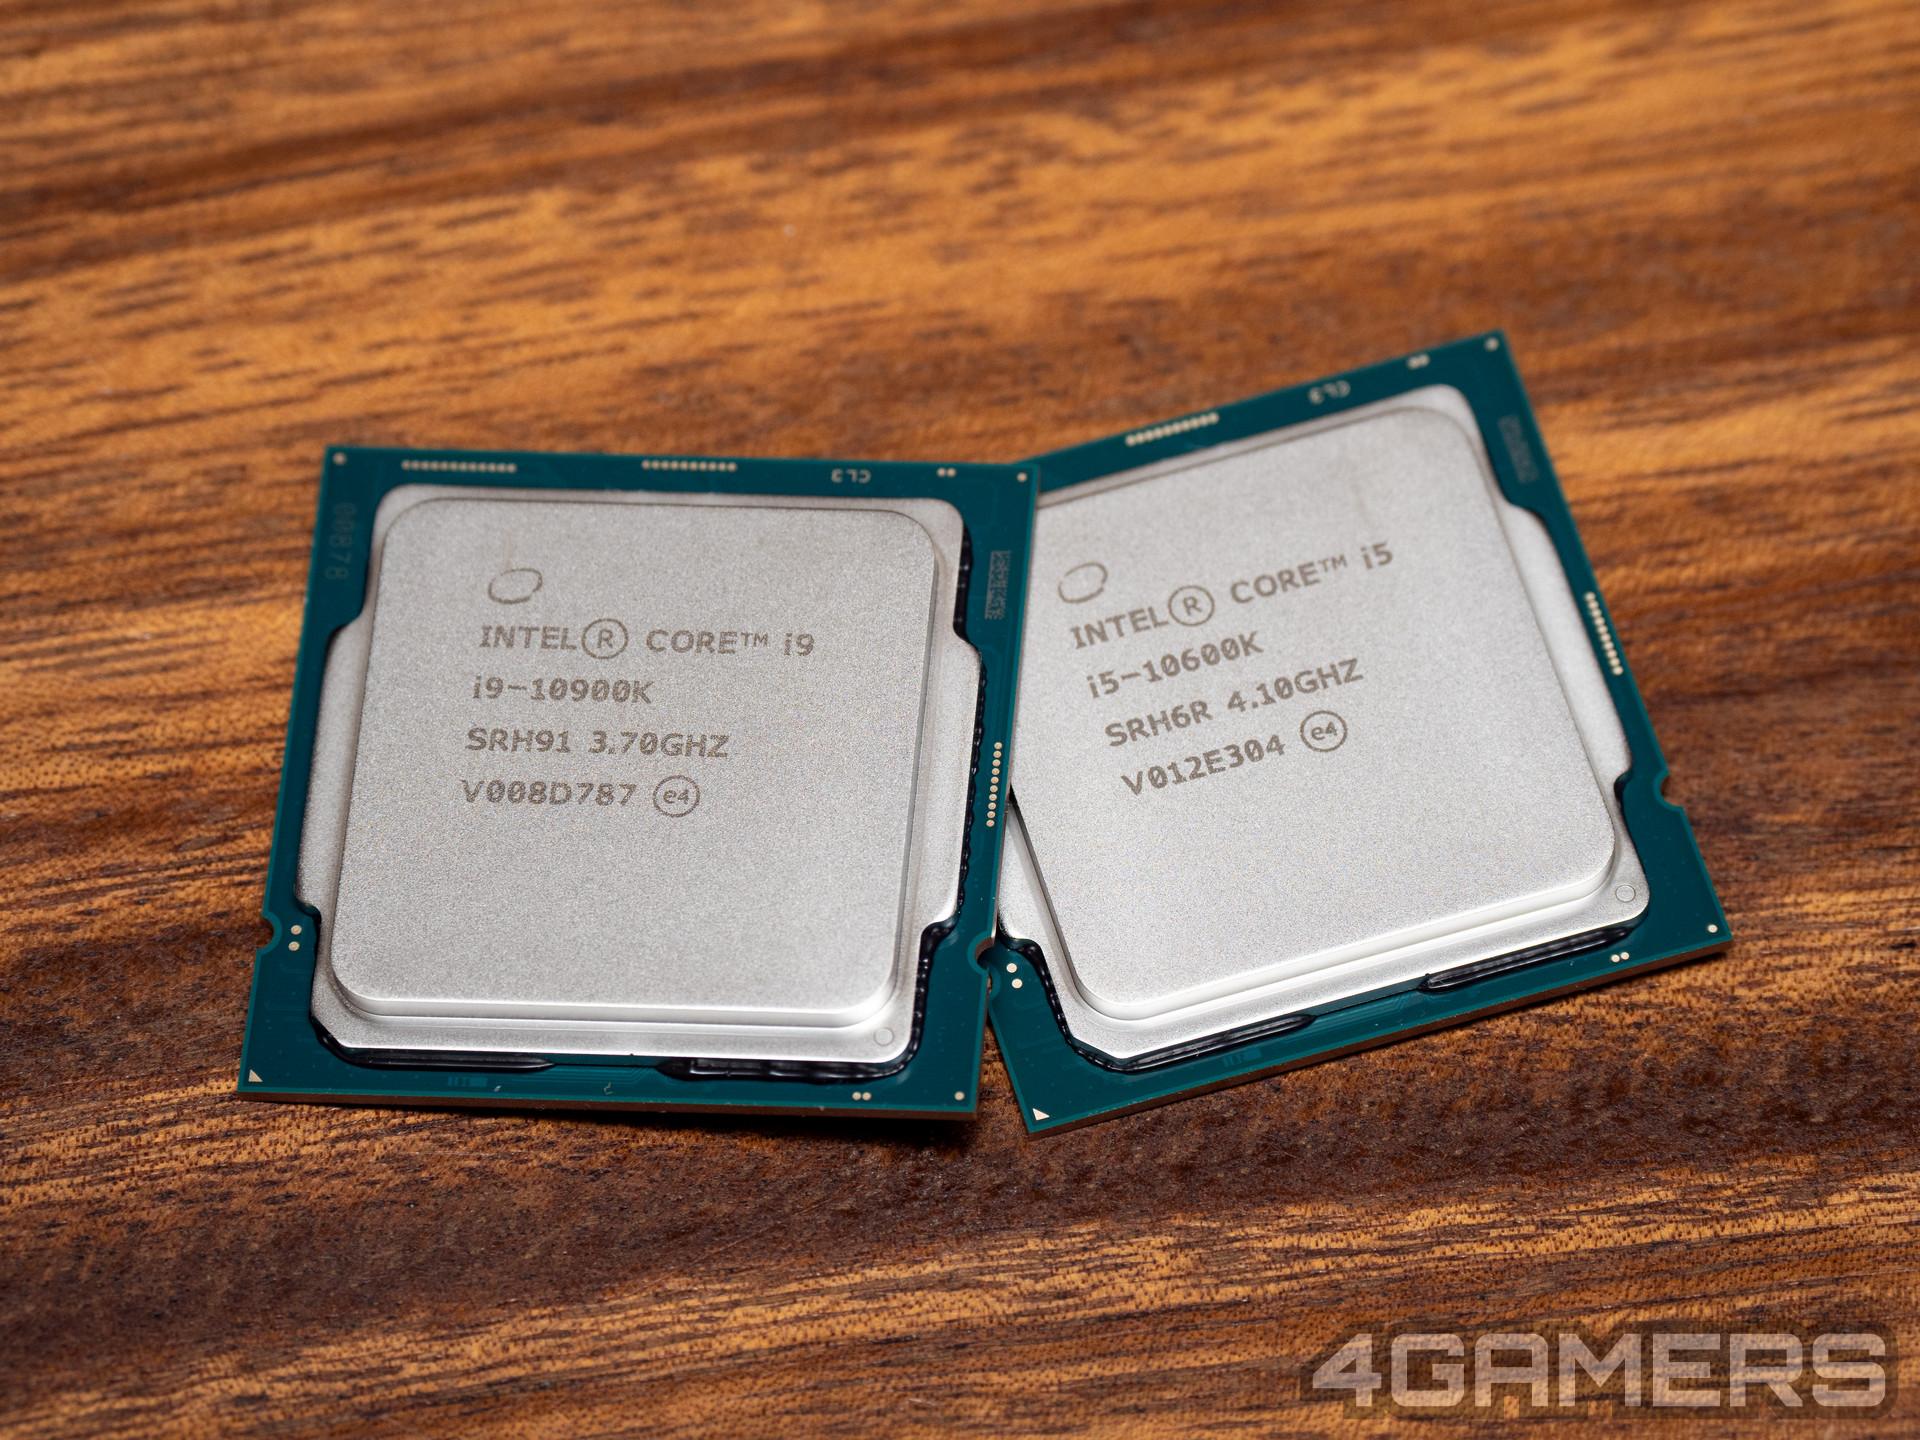 Intel Core i9-10900K and i5-10600K